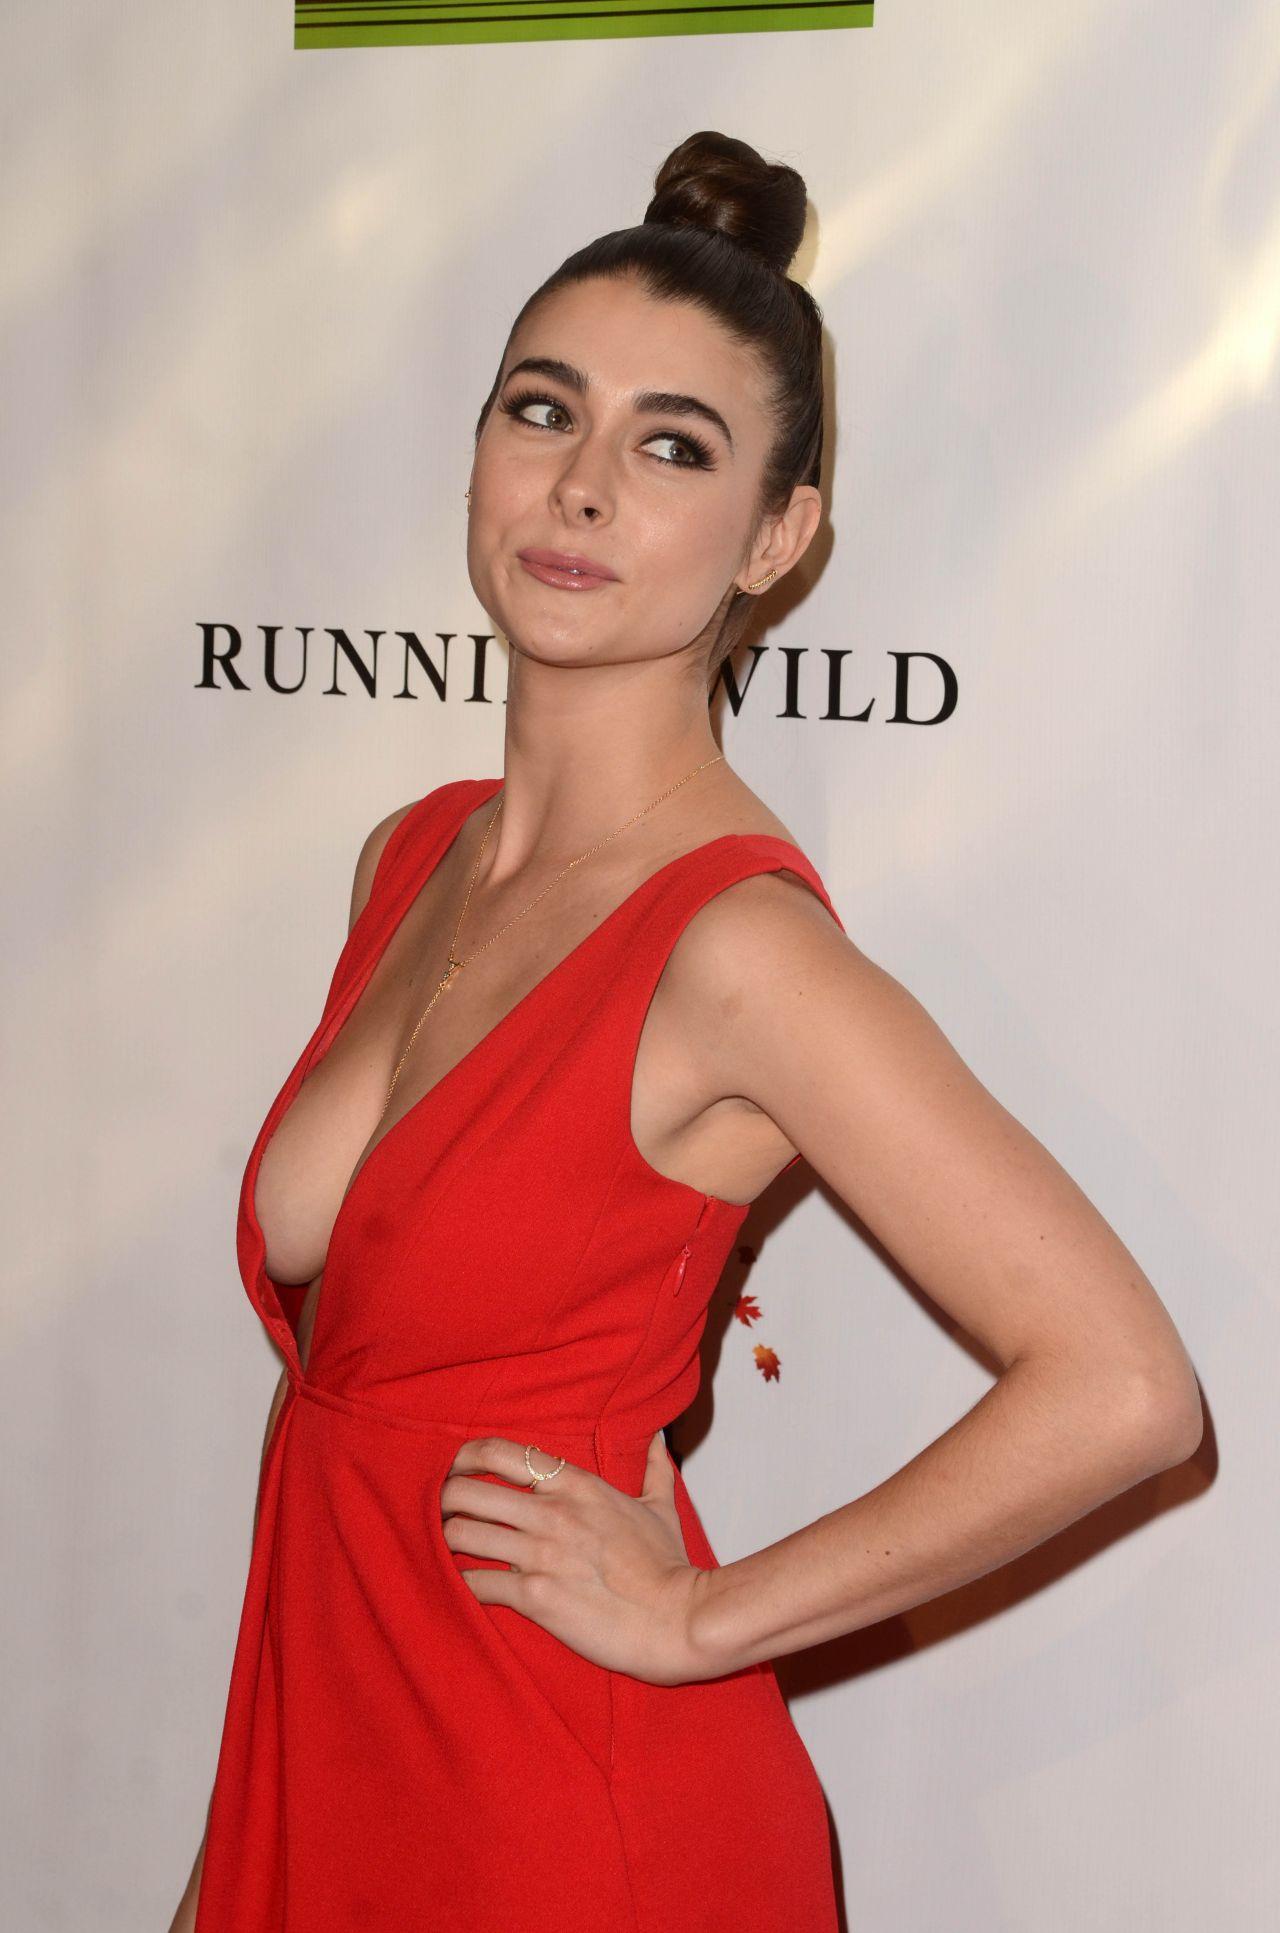 Allison Paige - Sony Picturess Running Wild Premiere in